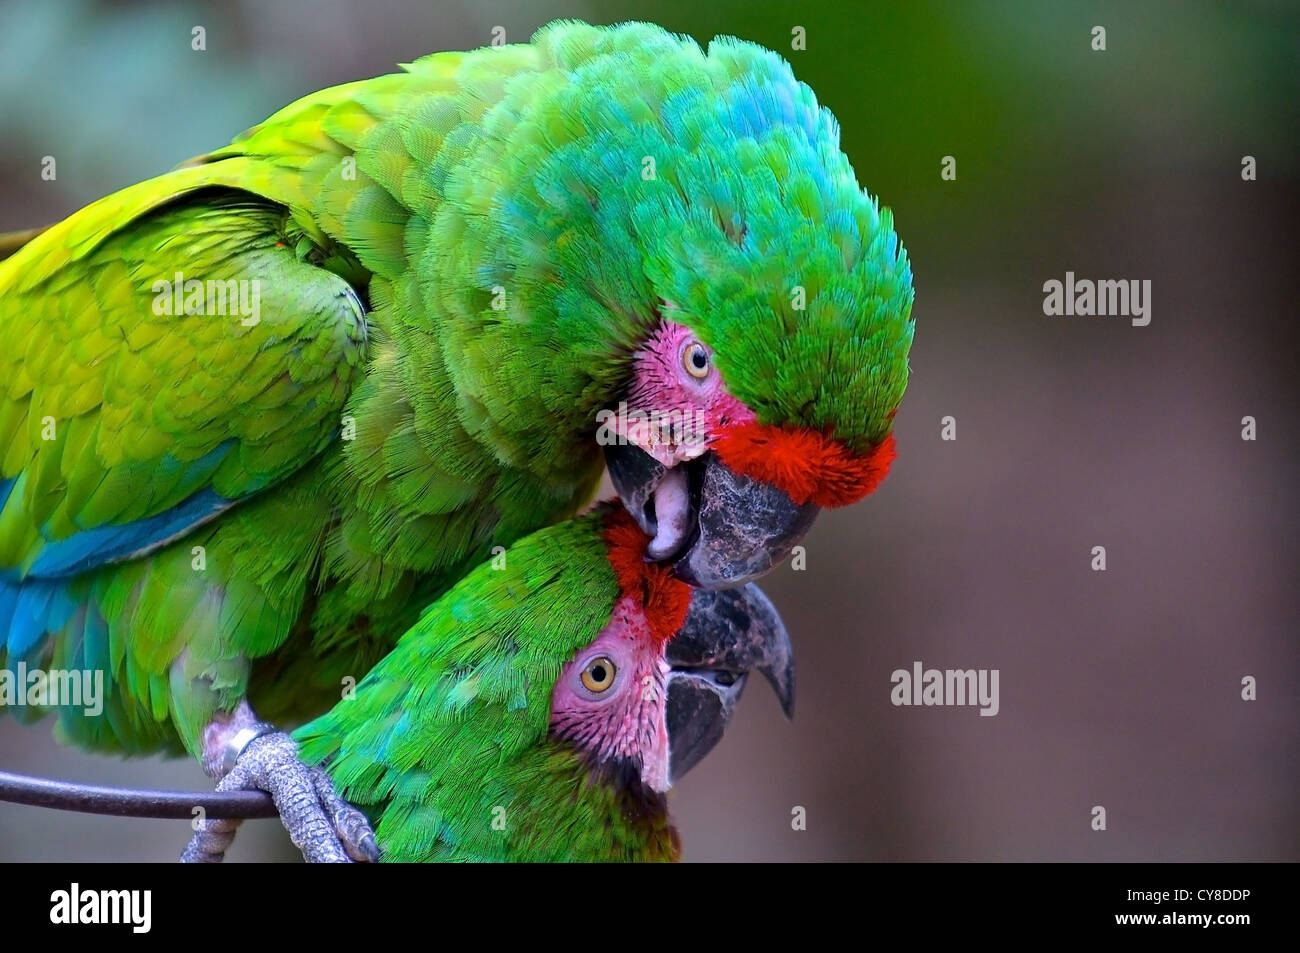 Preening green macaws - Stock Image